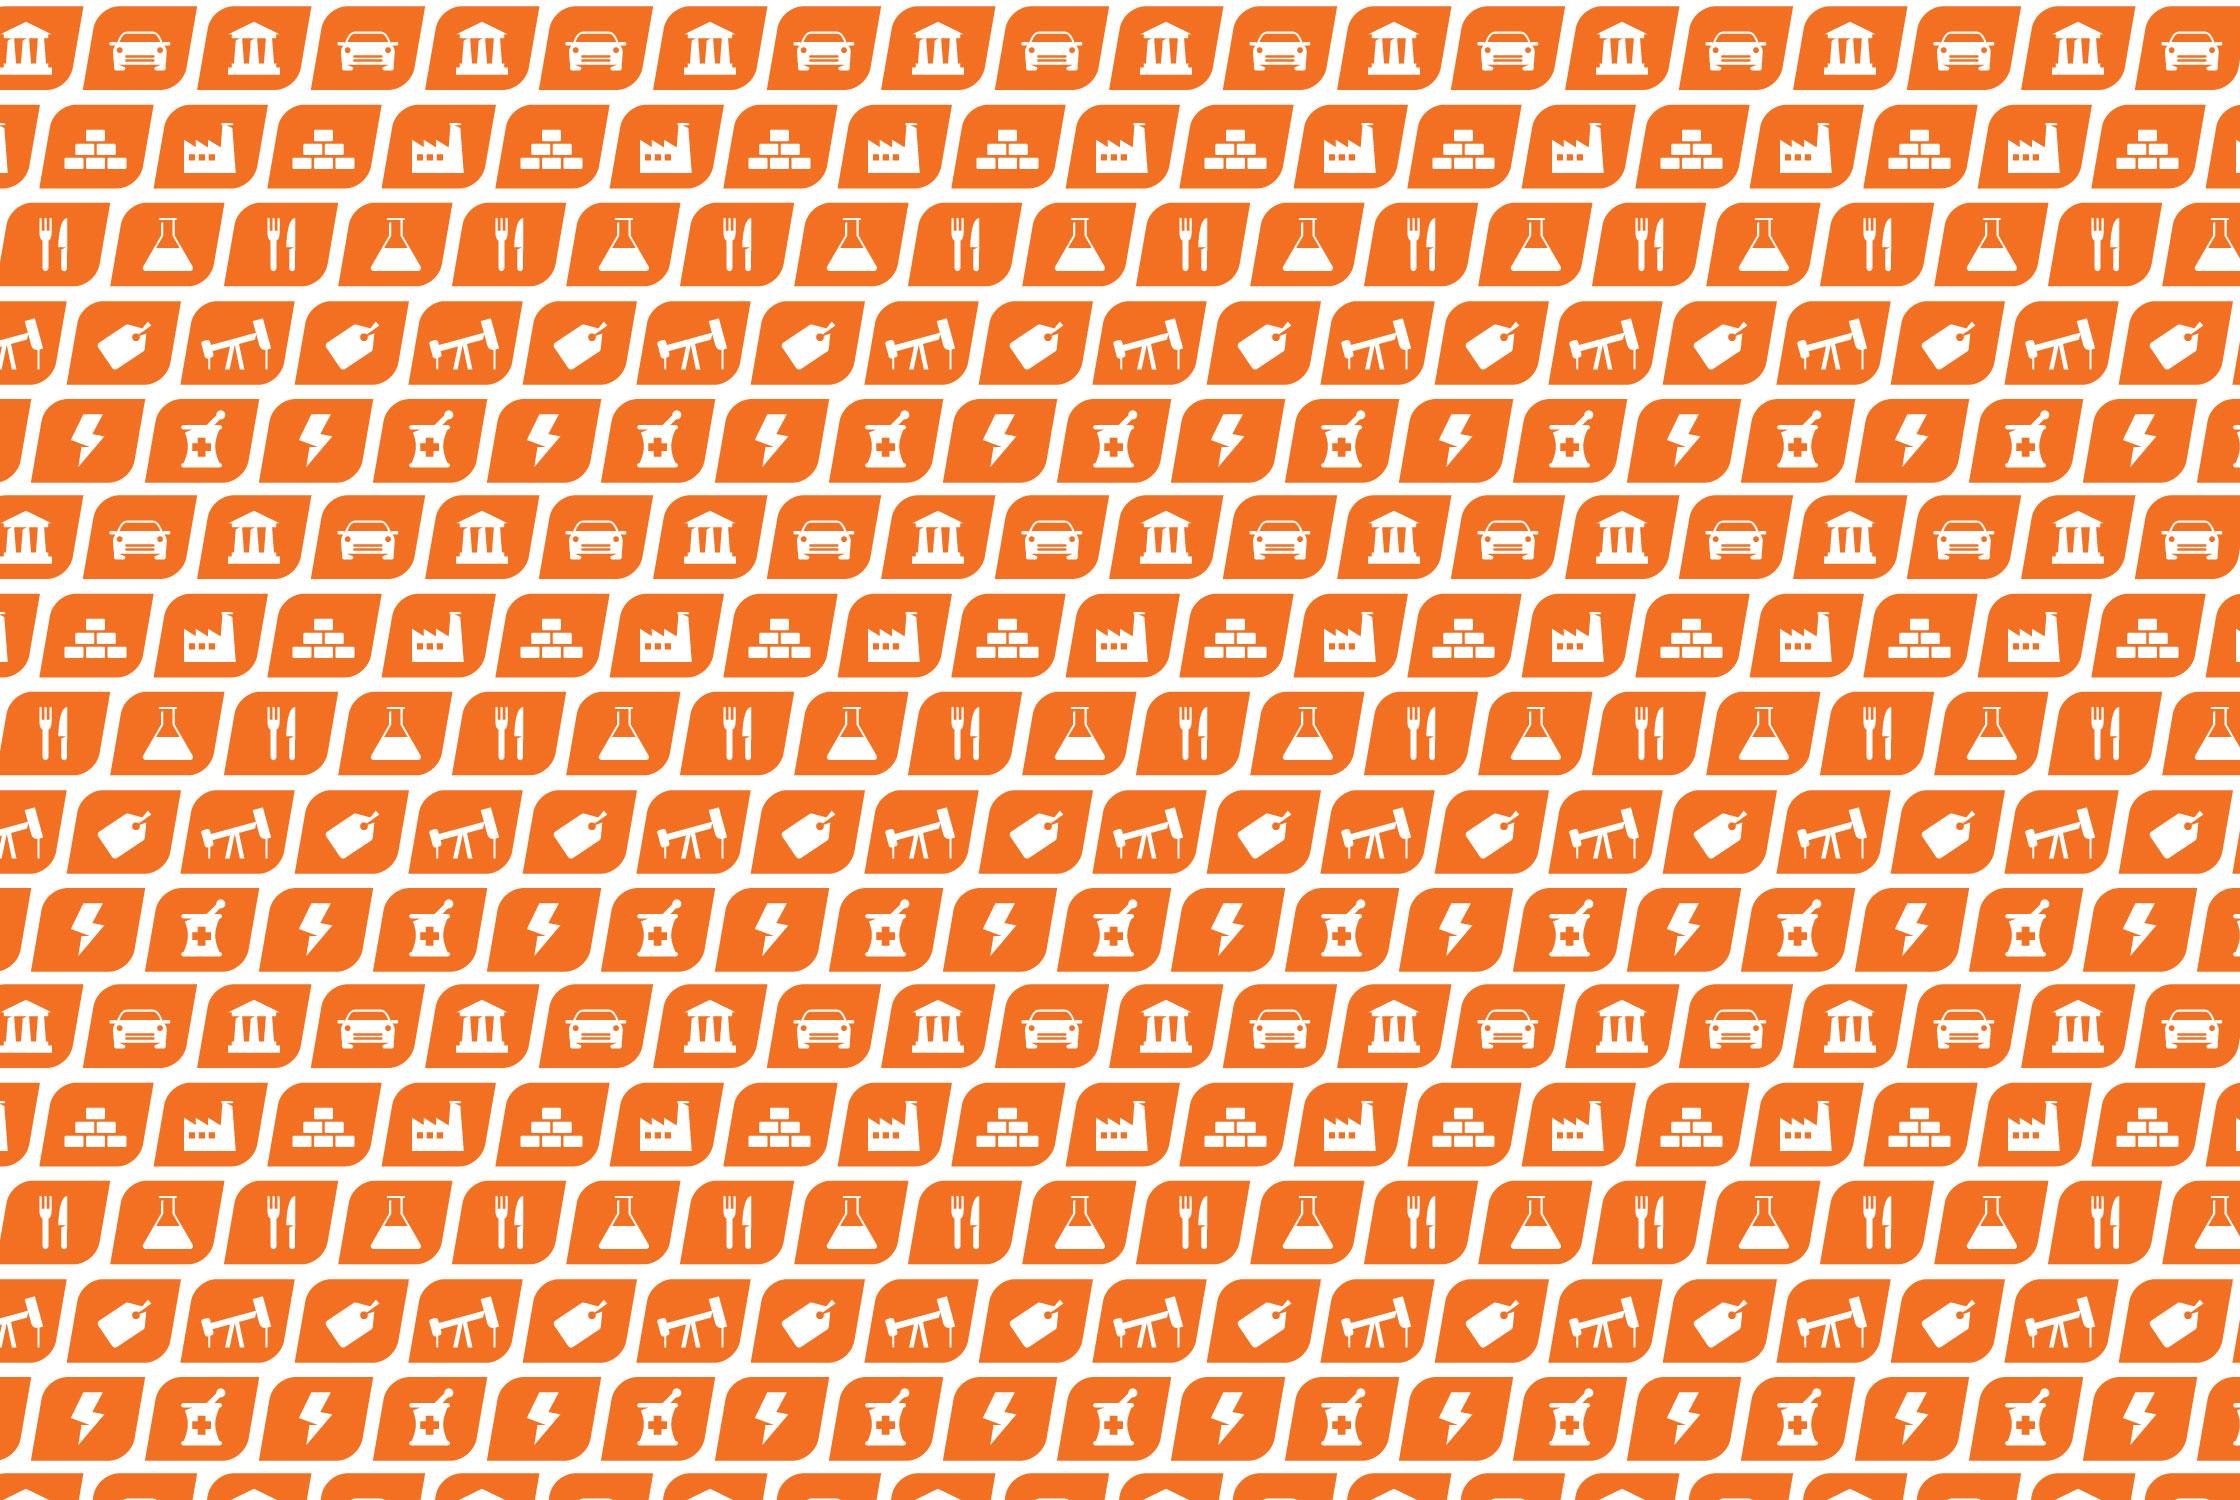 Pattern: Reverse icon